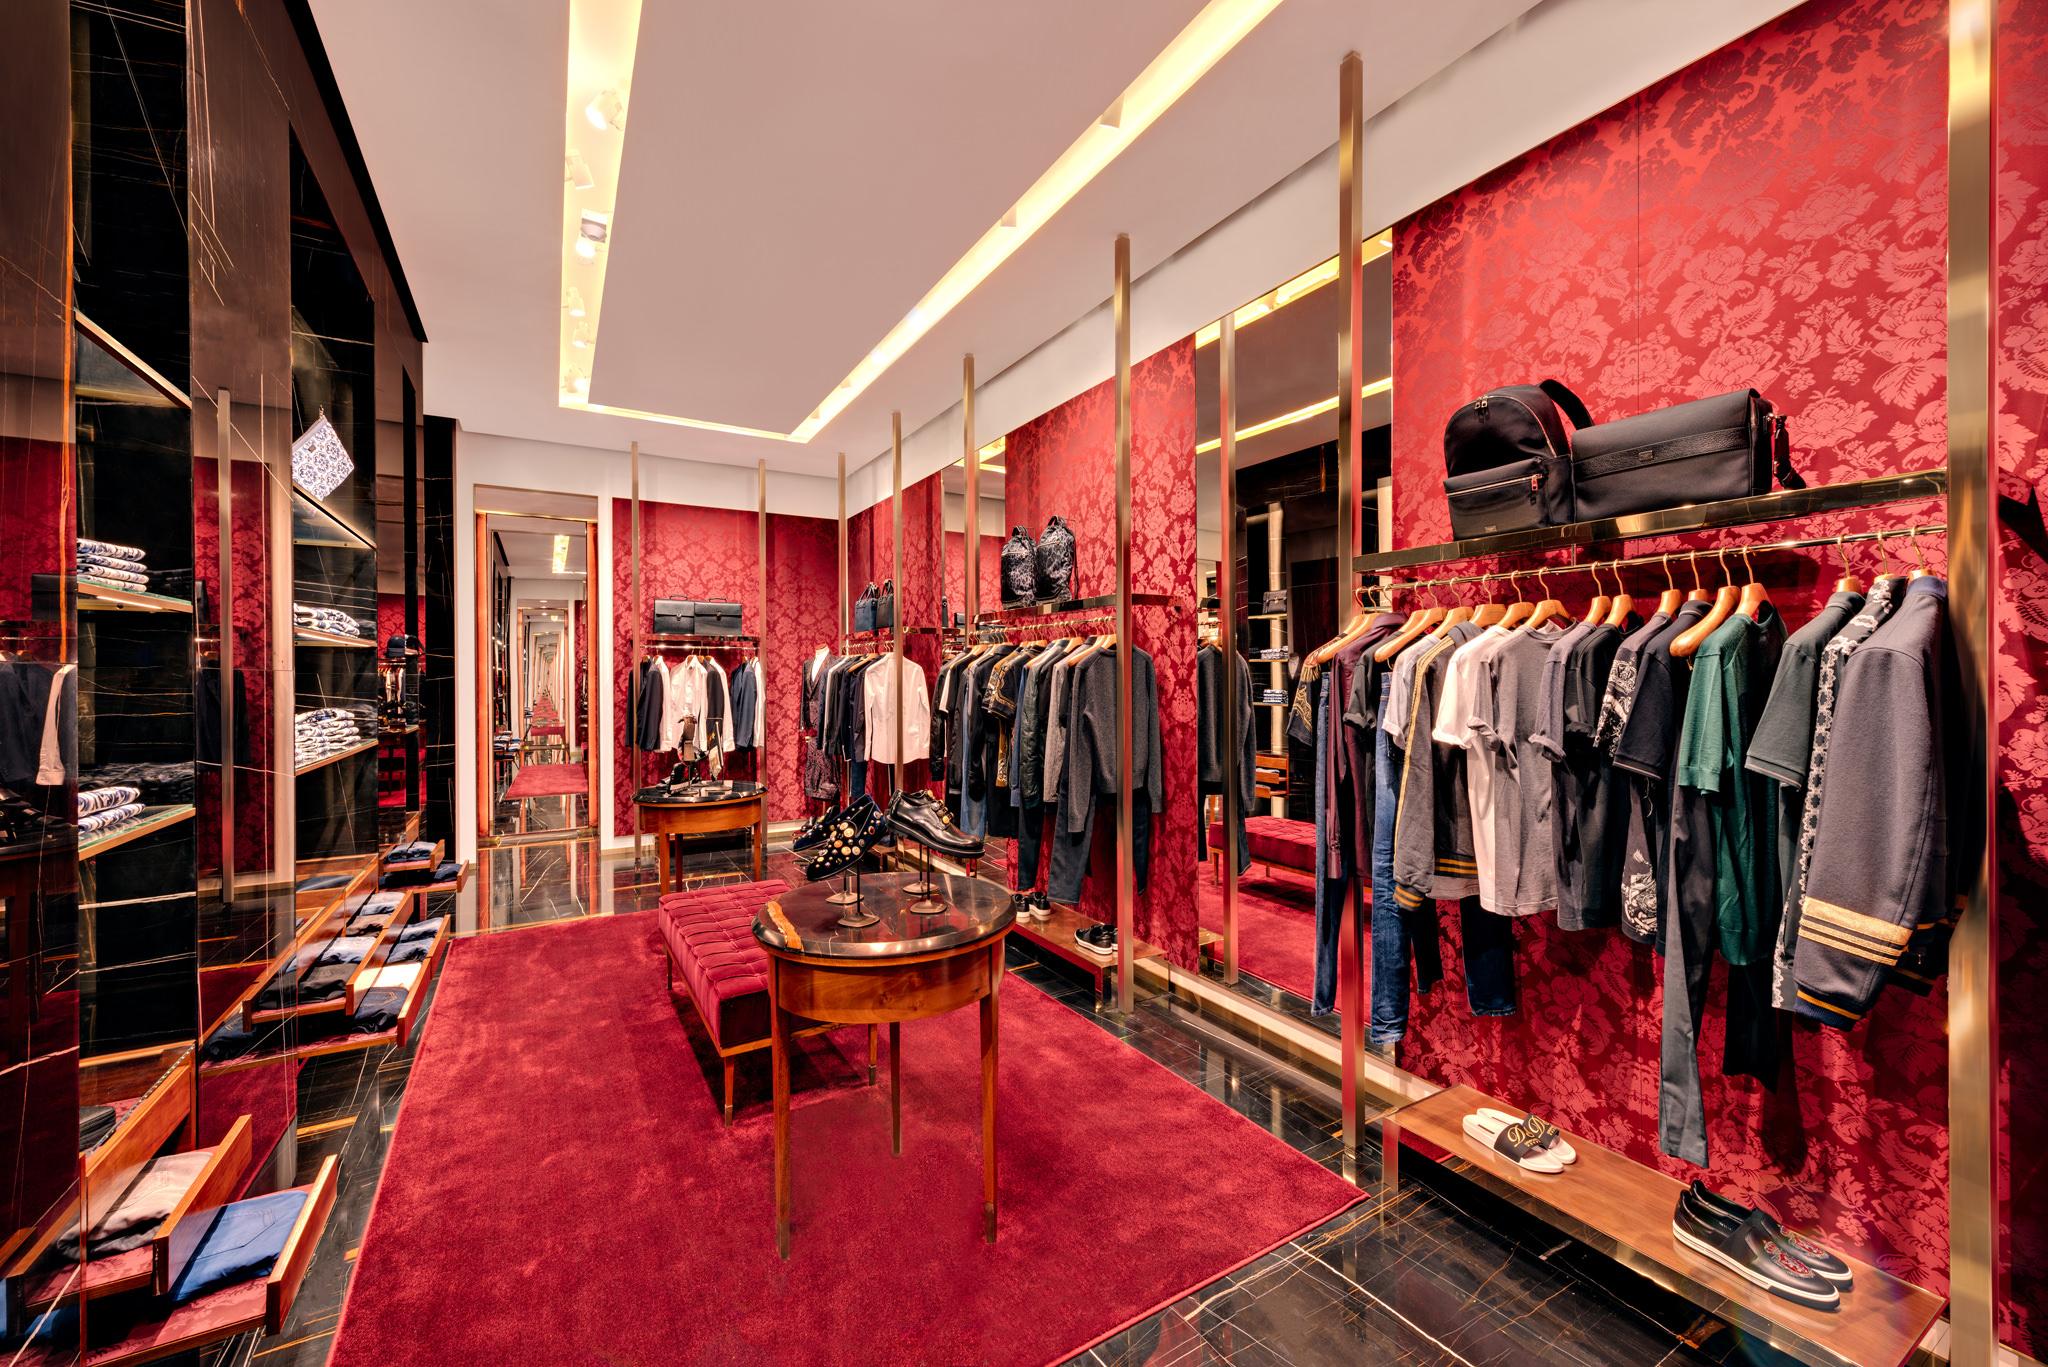 20171011 - Dolce & Gabbana - HCM - Commercial - Interior - Store - Retouch 0082.jpg